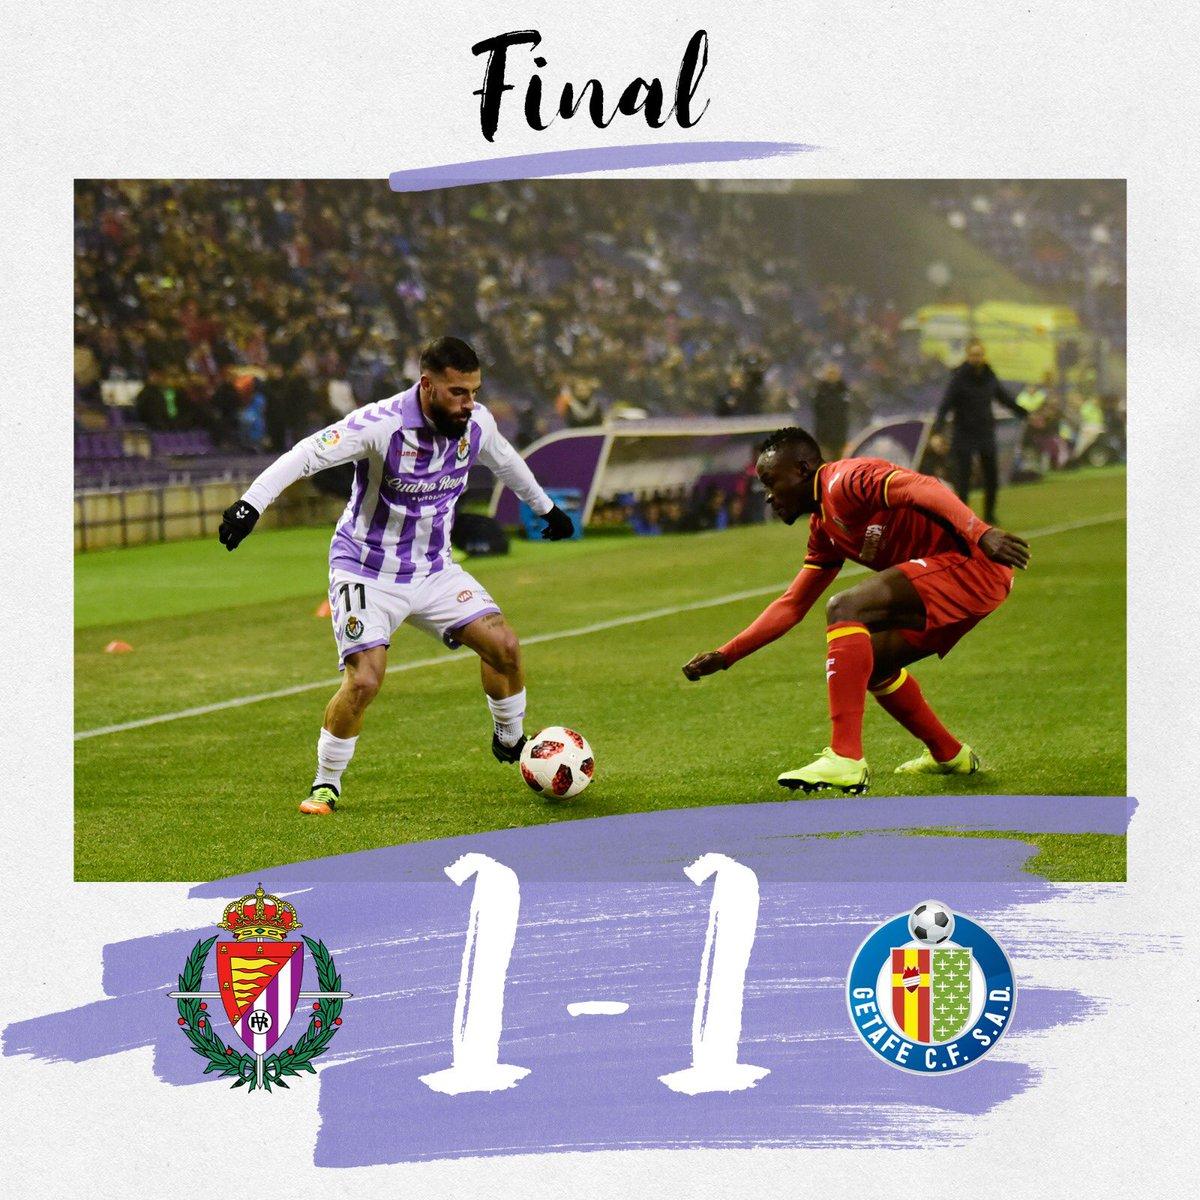 Real Valladolid C.F.'s photo on Alcaraz